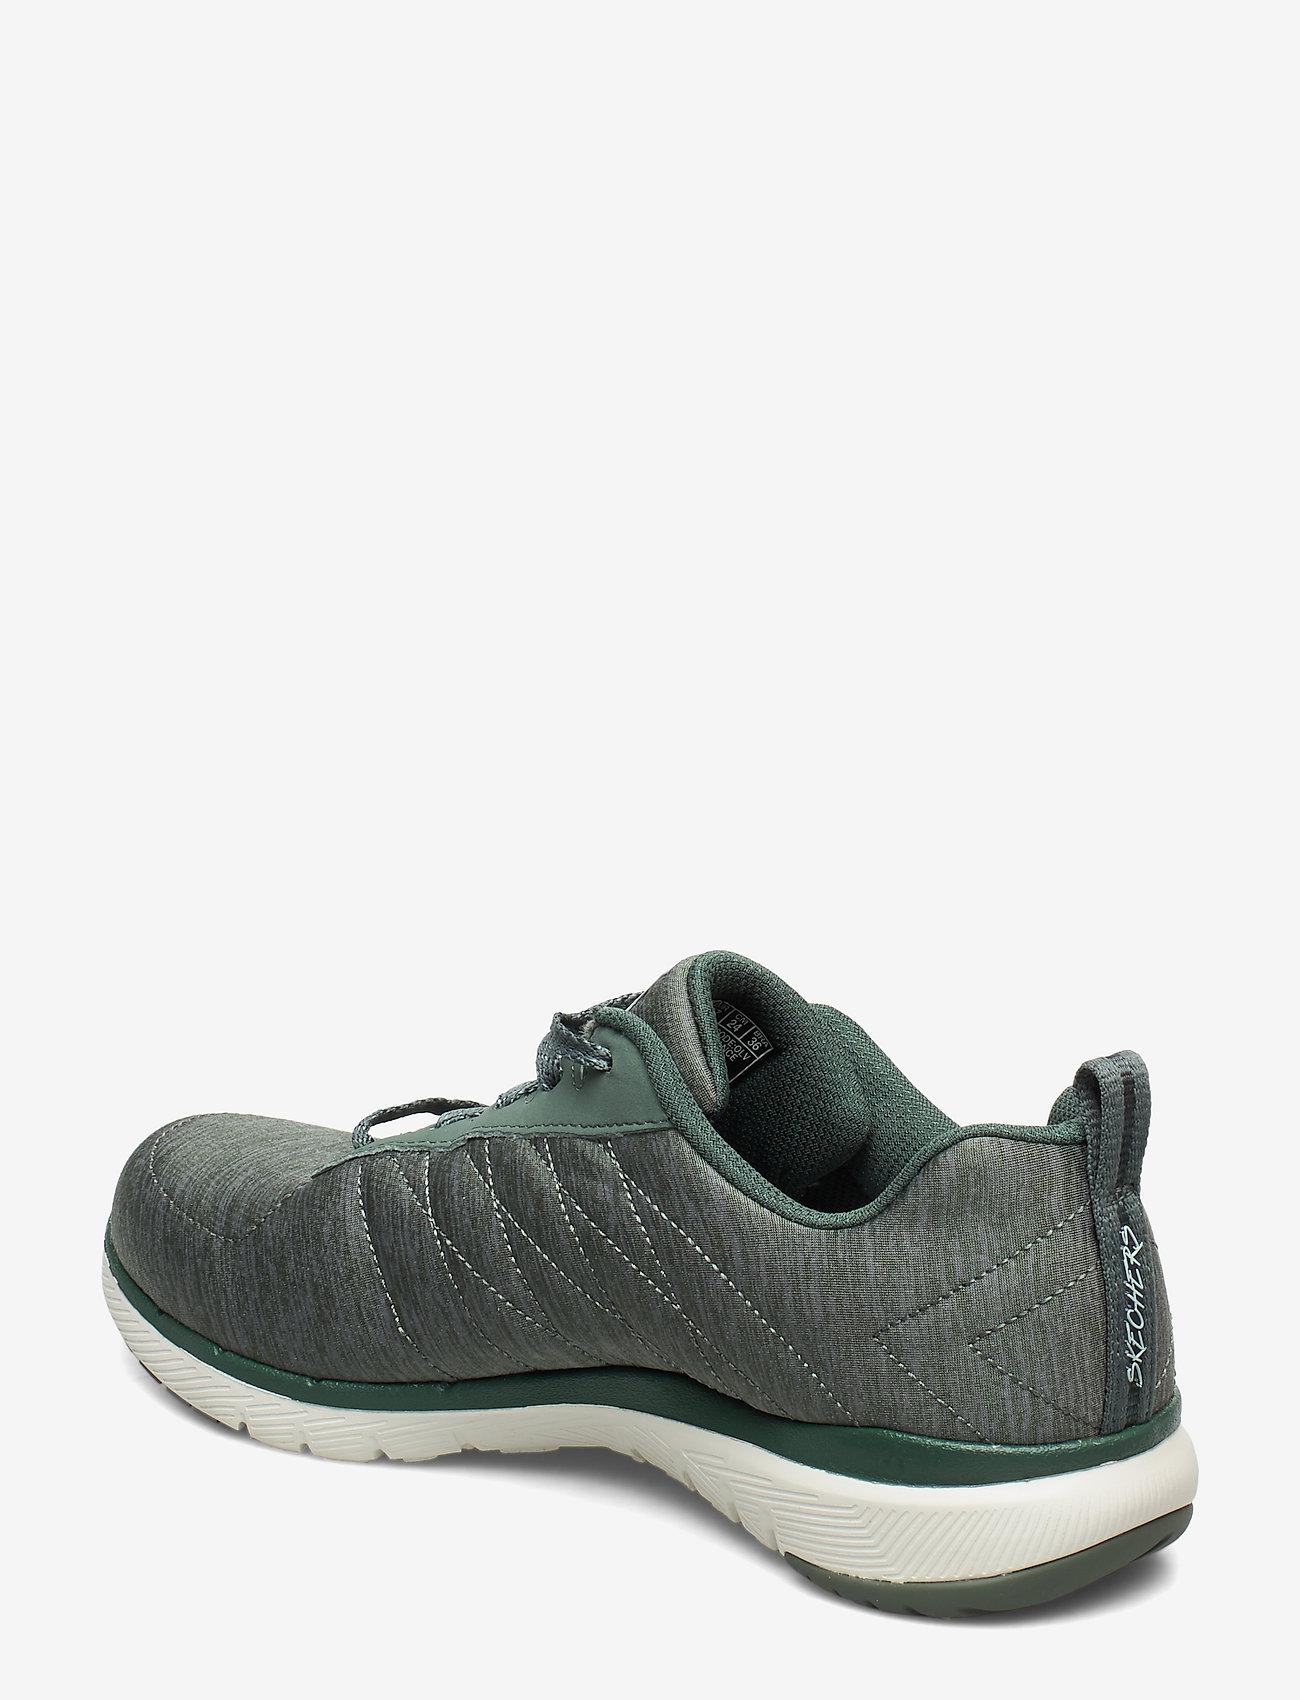 Womens Flex Appeal 3.0 (Olv Olive) - Skechers